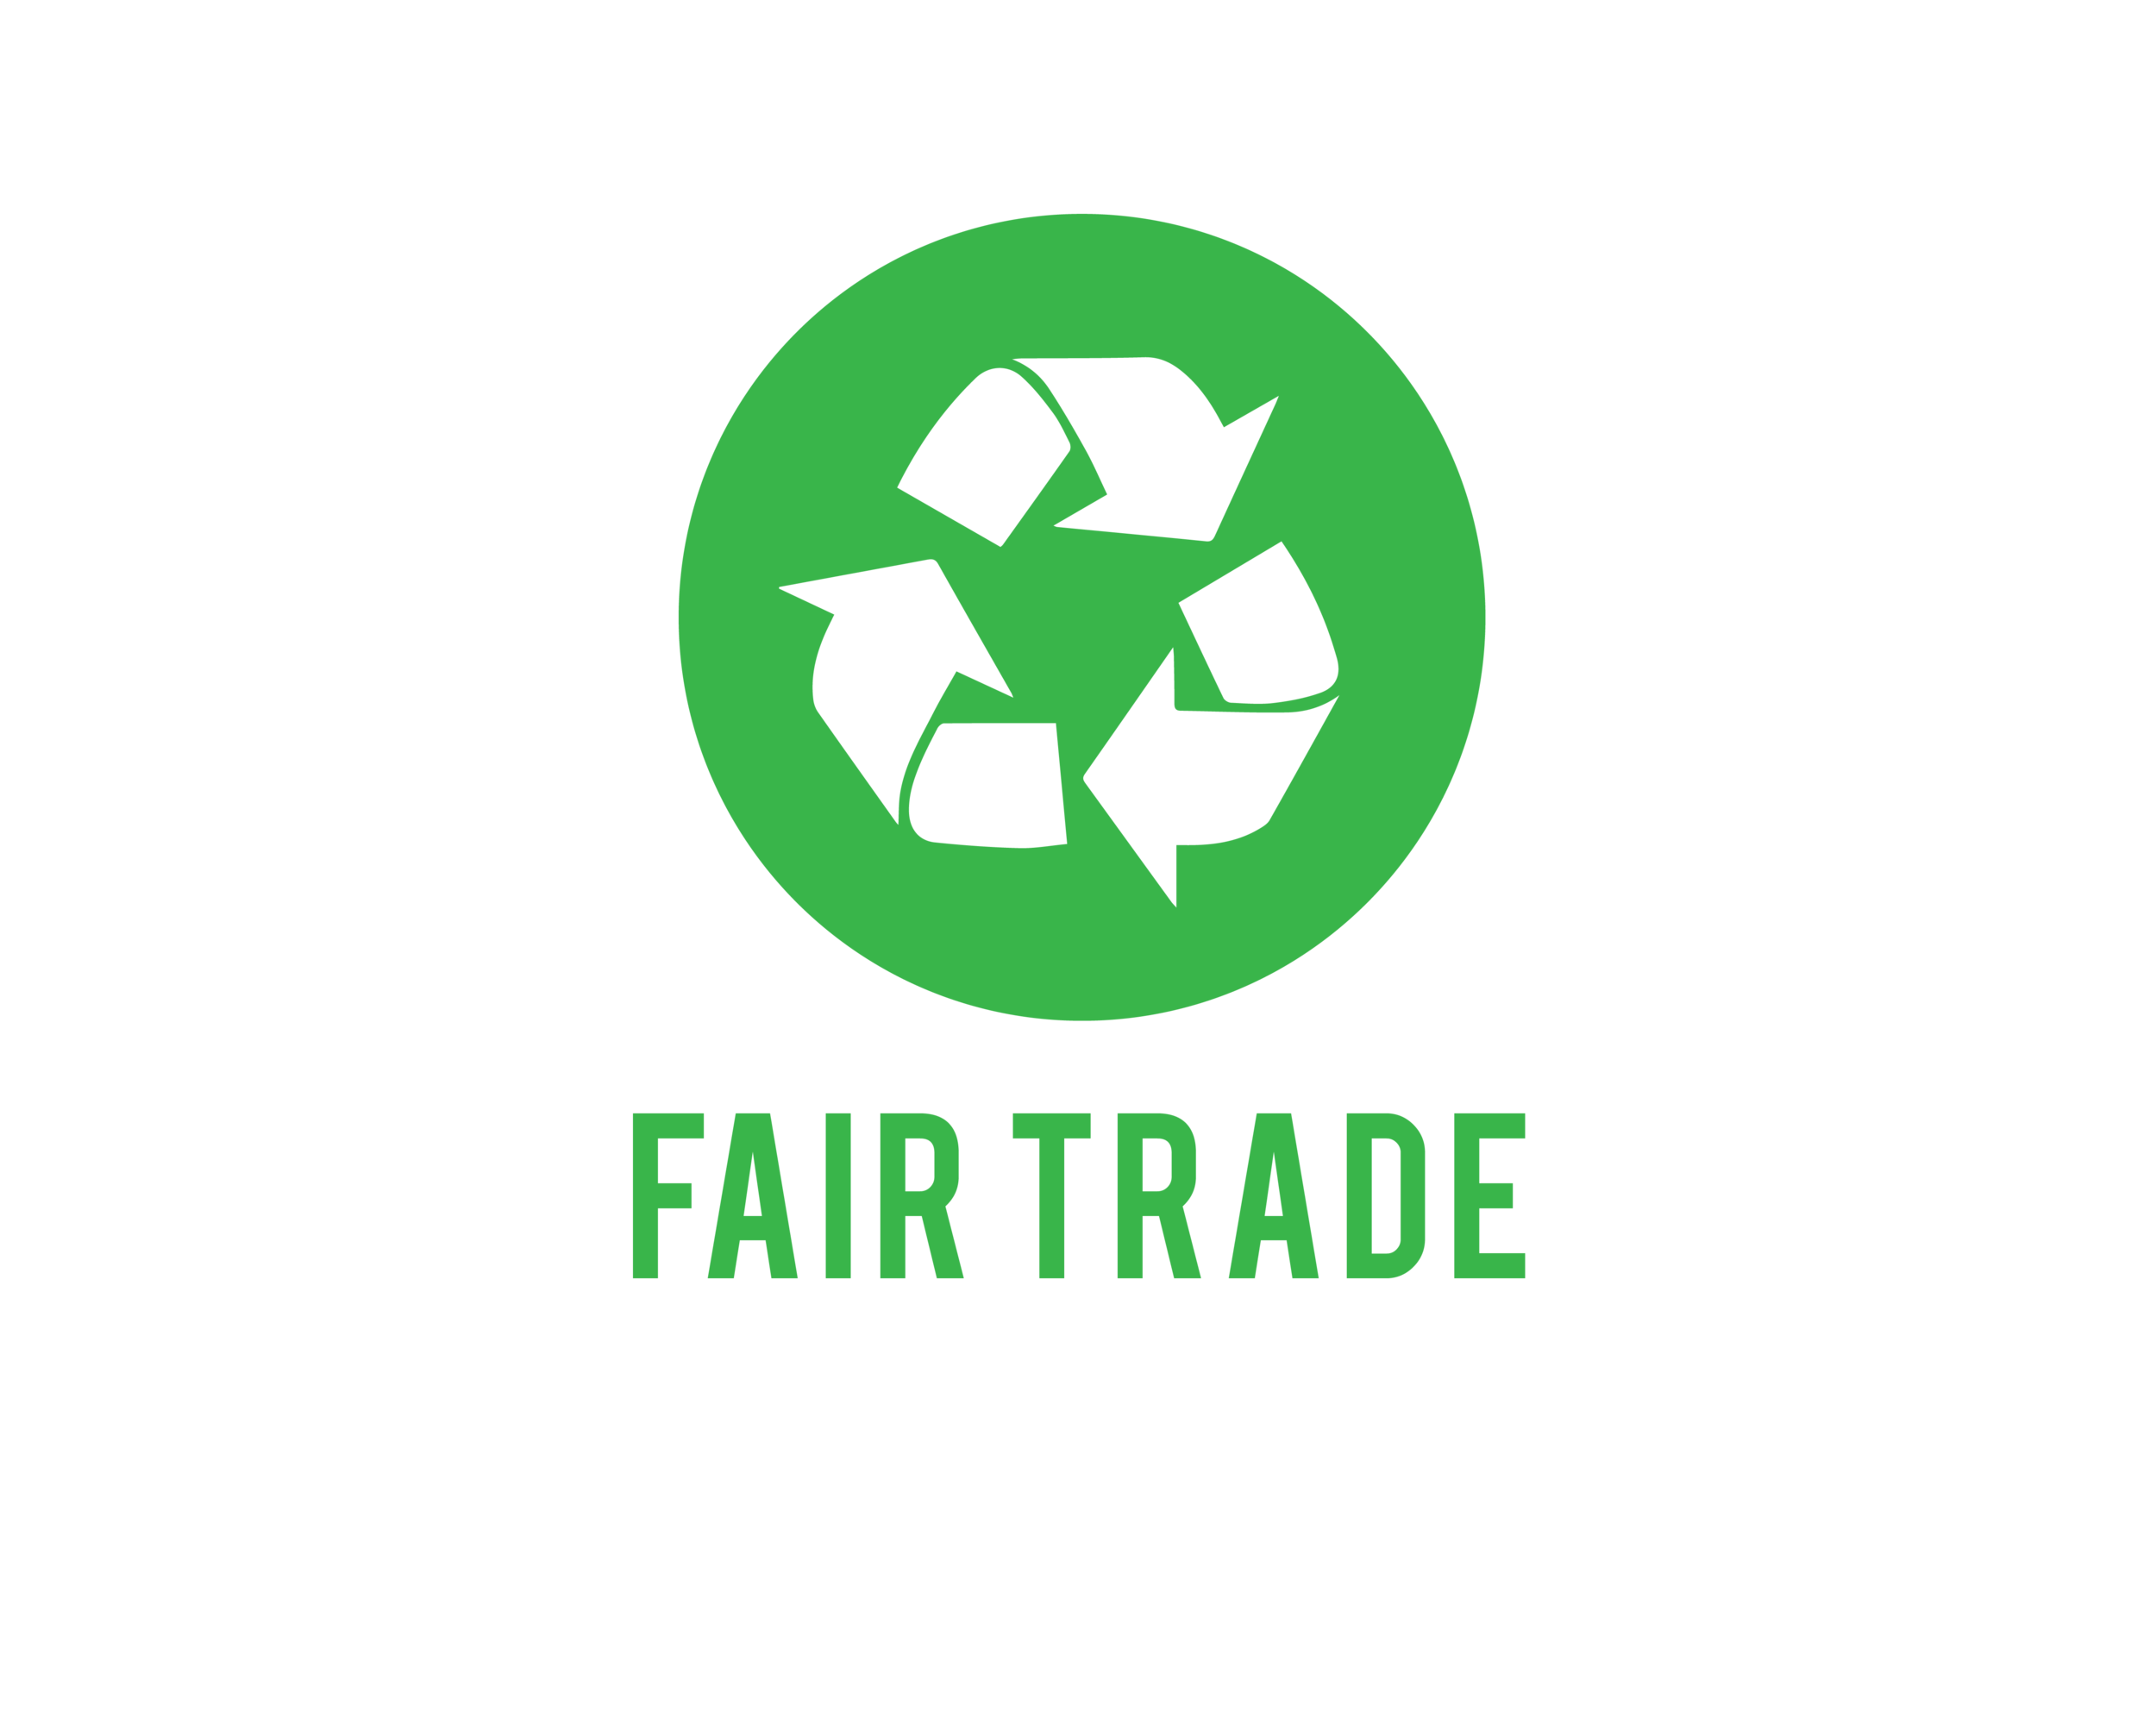 fair-trade-symbol-03.png